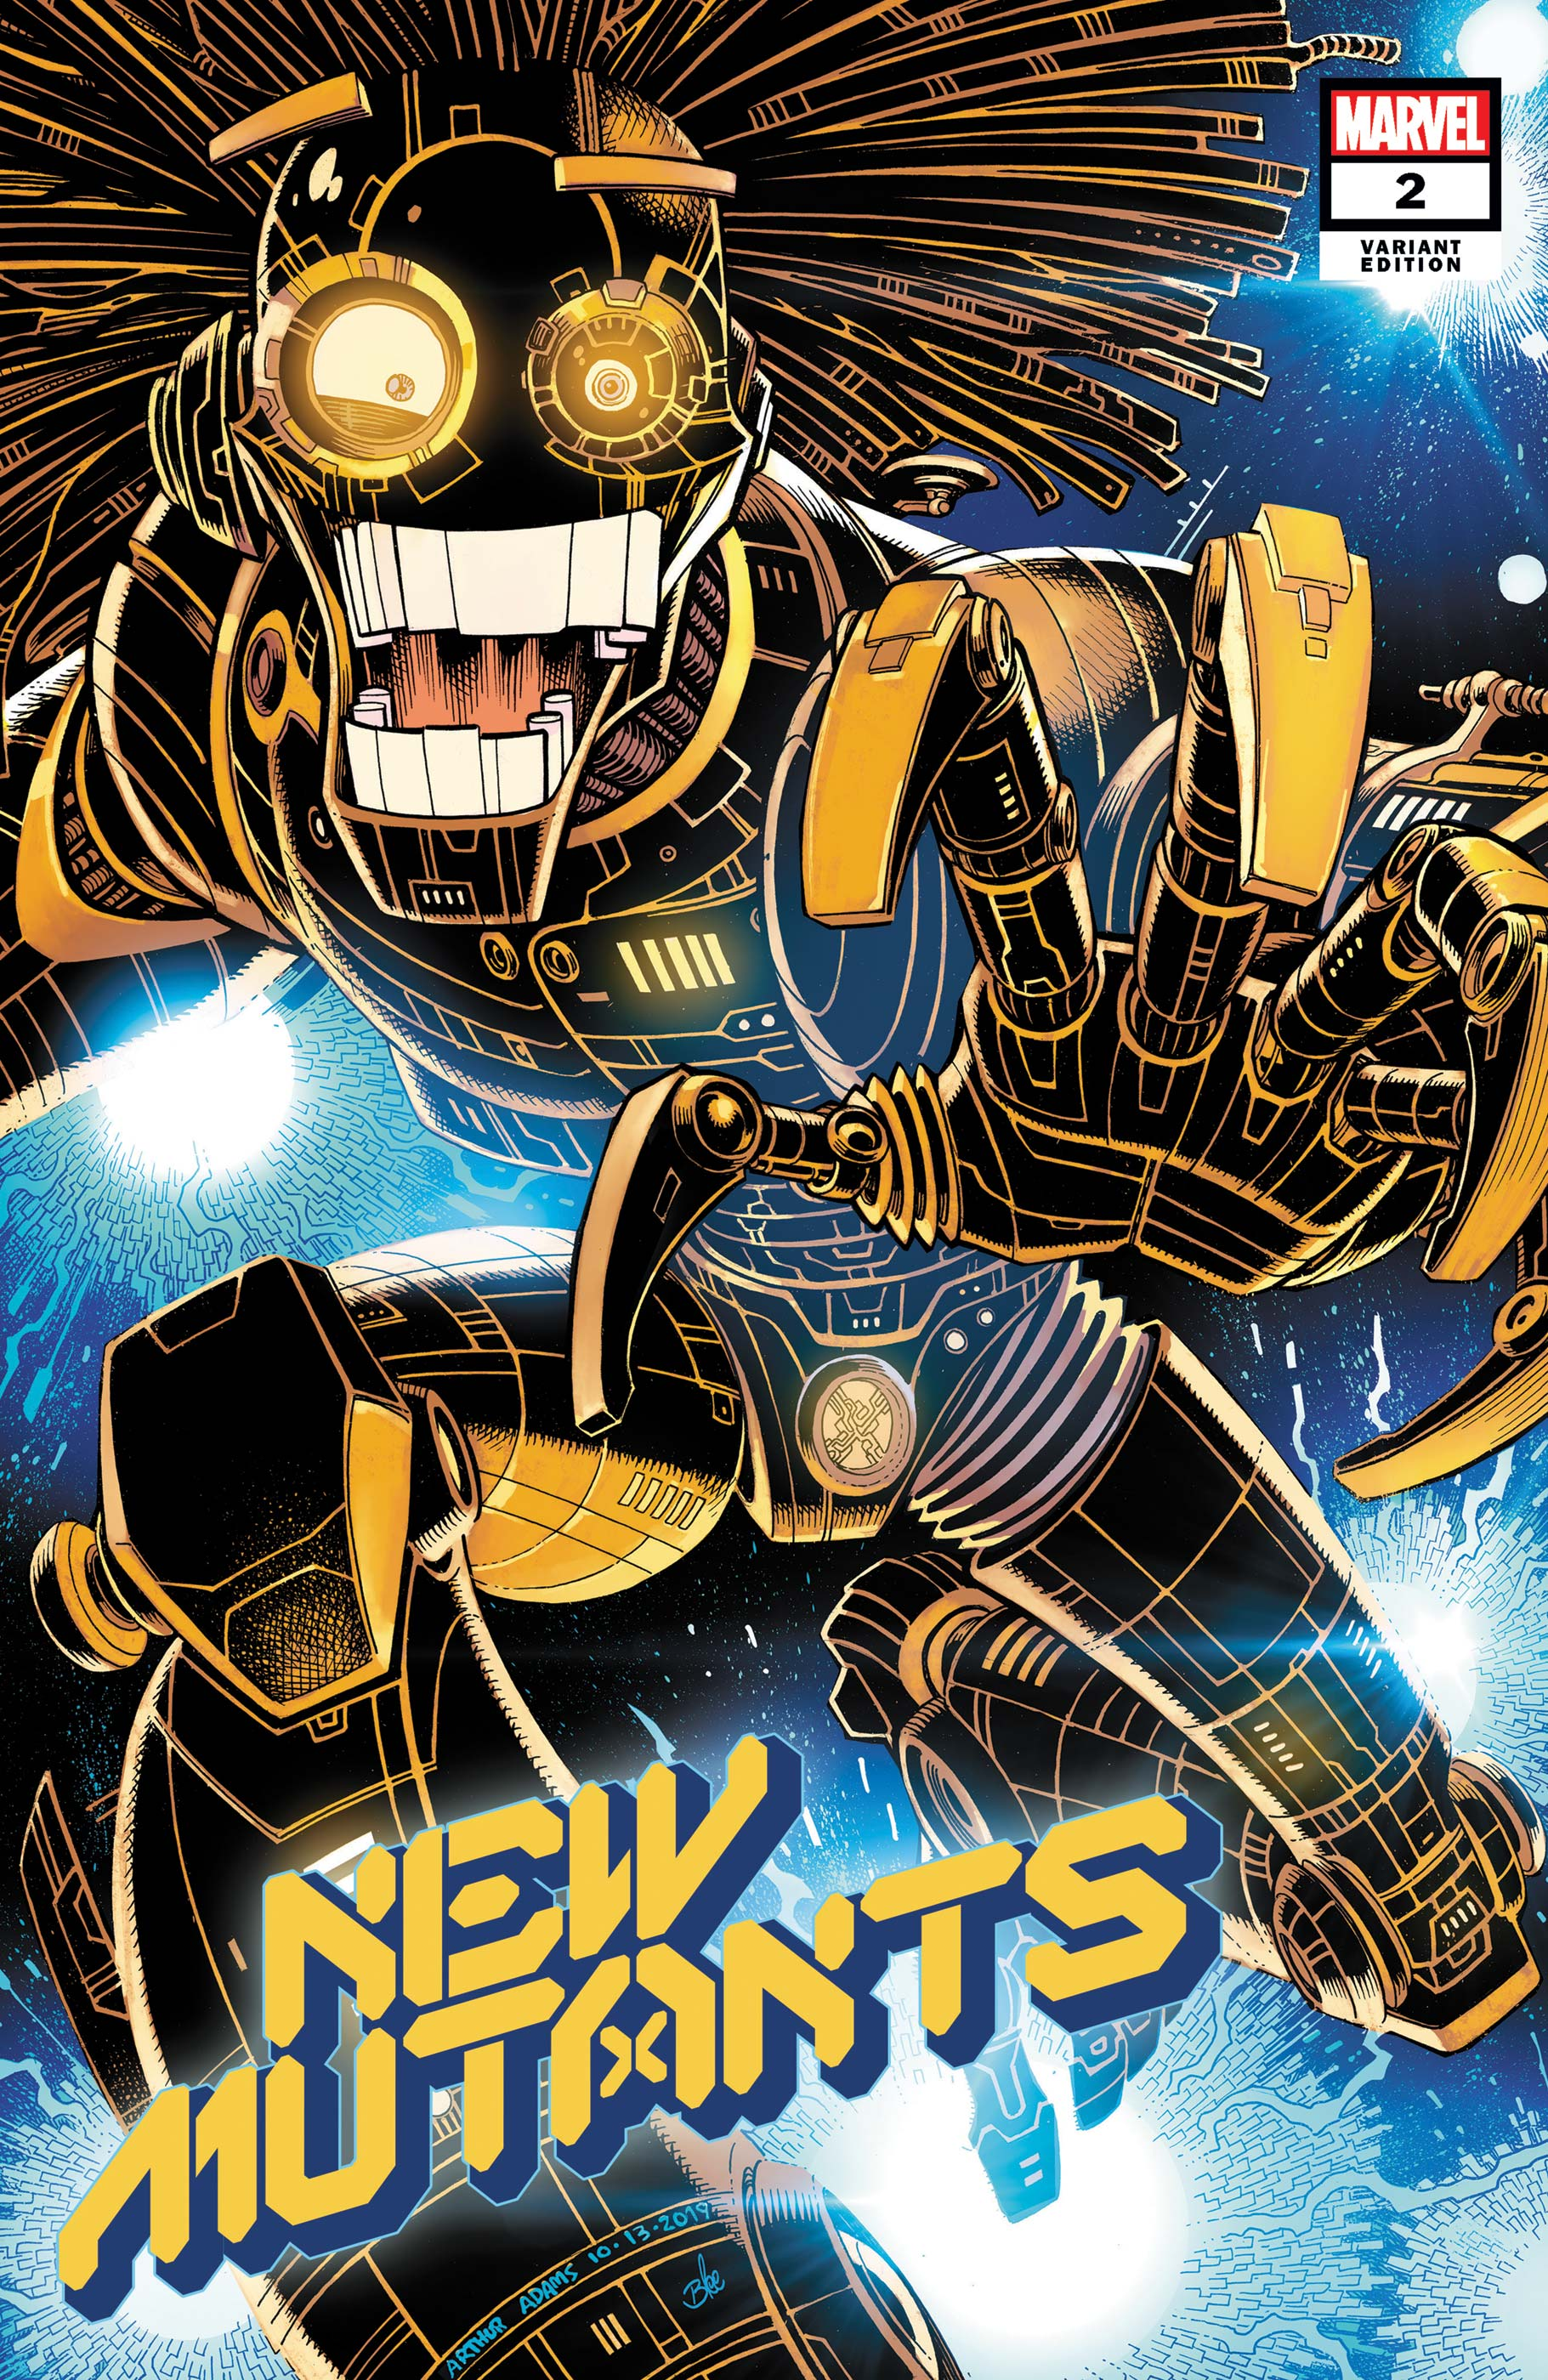 New Mutants (2019) #2 (Variant)